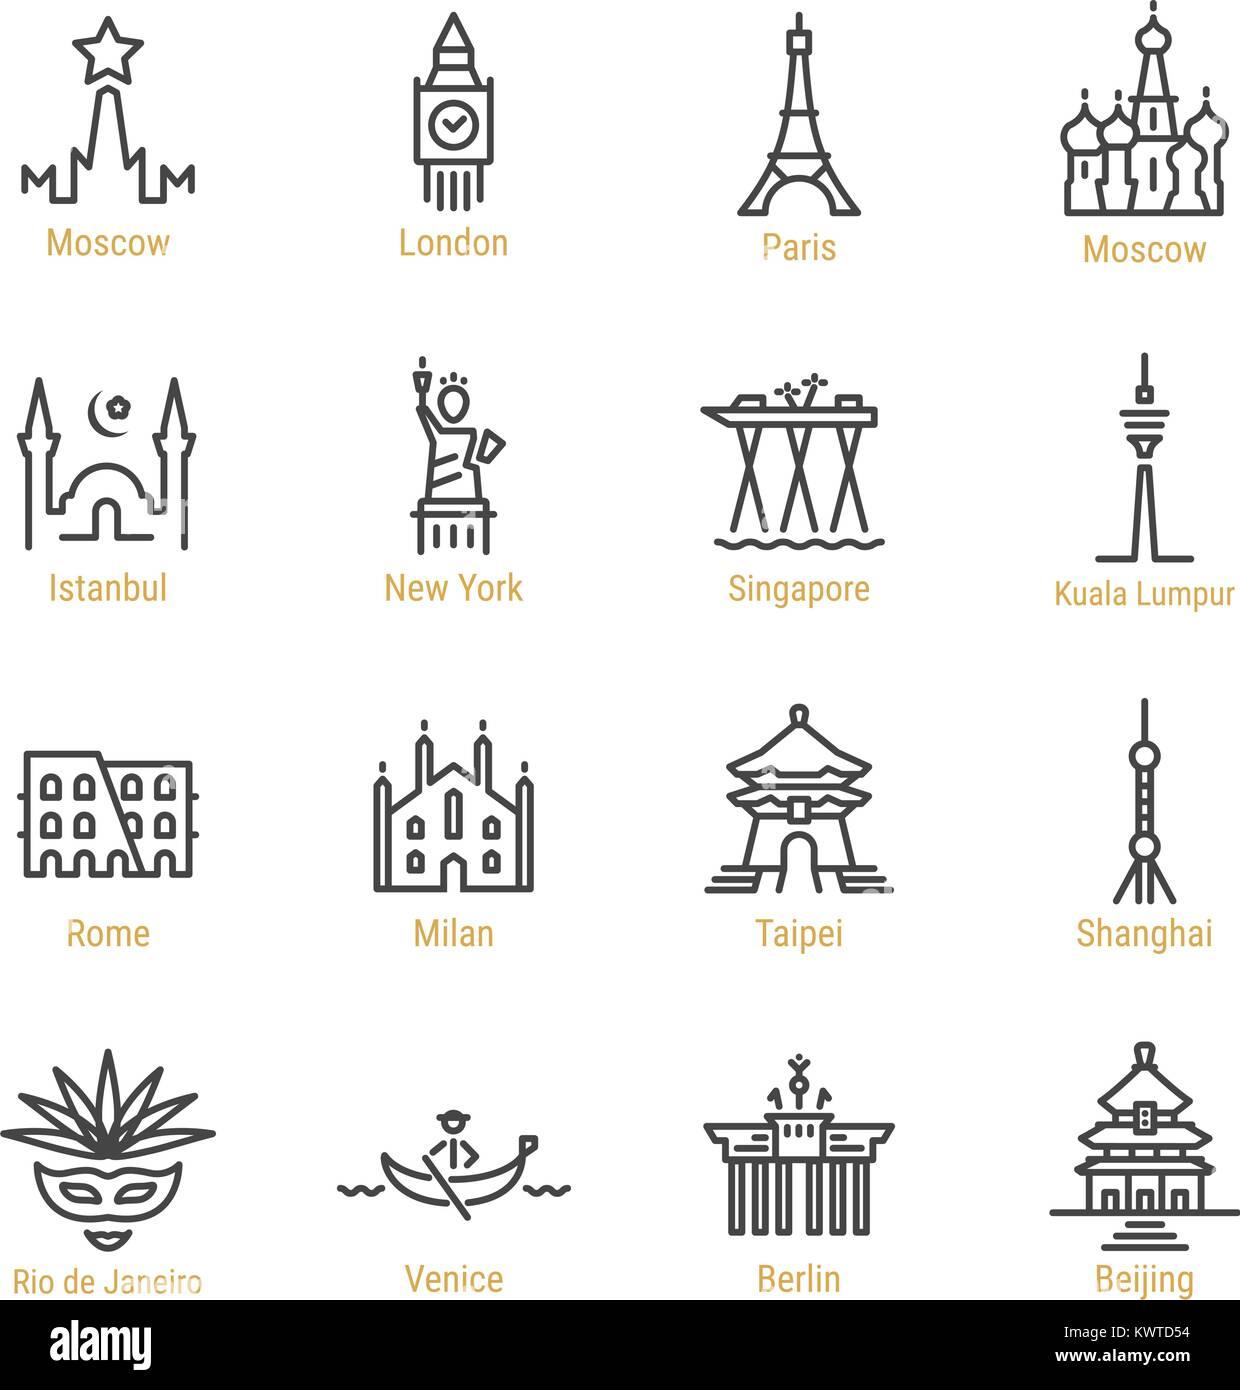 World Landmarks - Vector Line Icon Set - Part I - Stock Vector